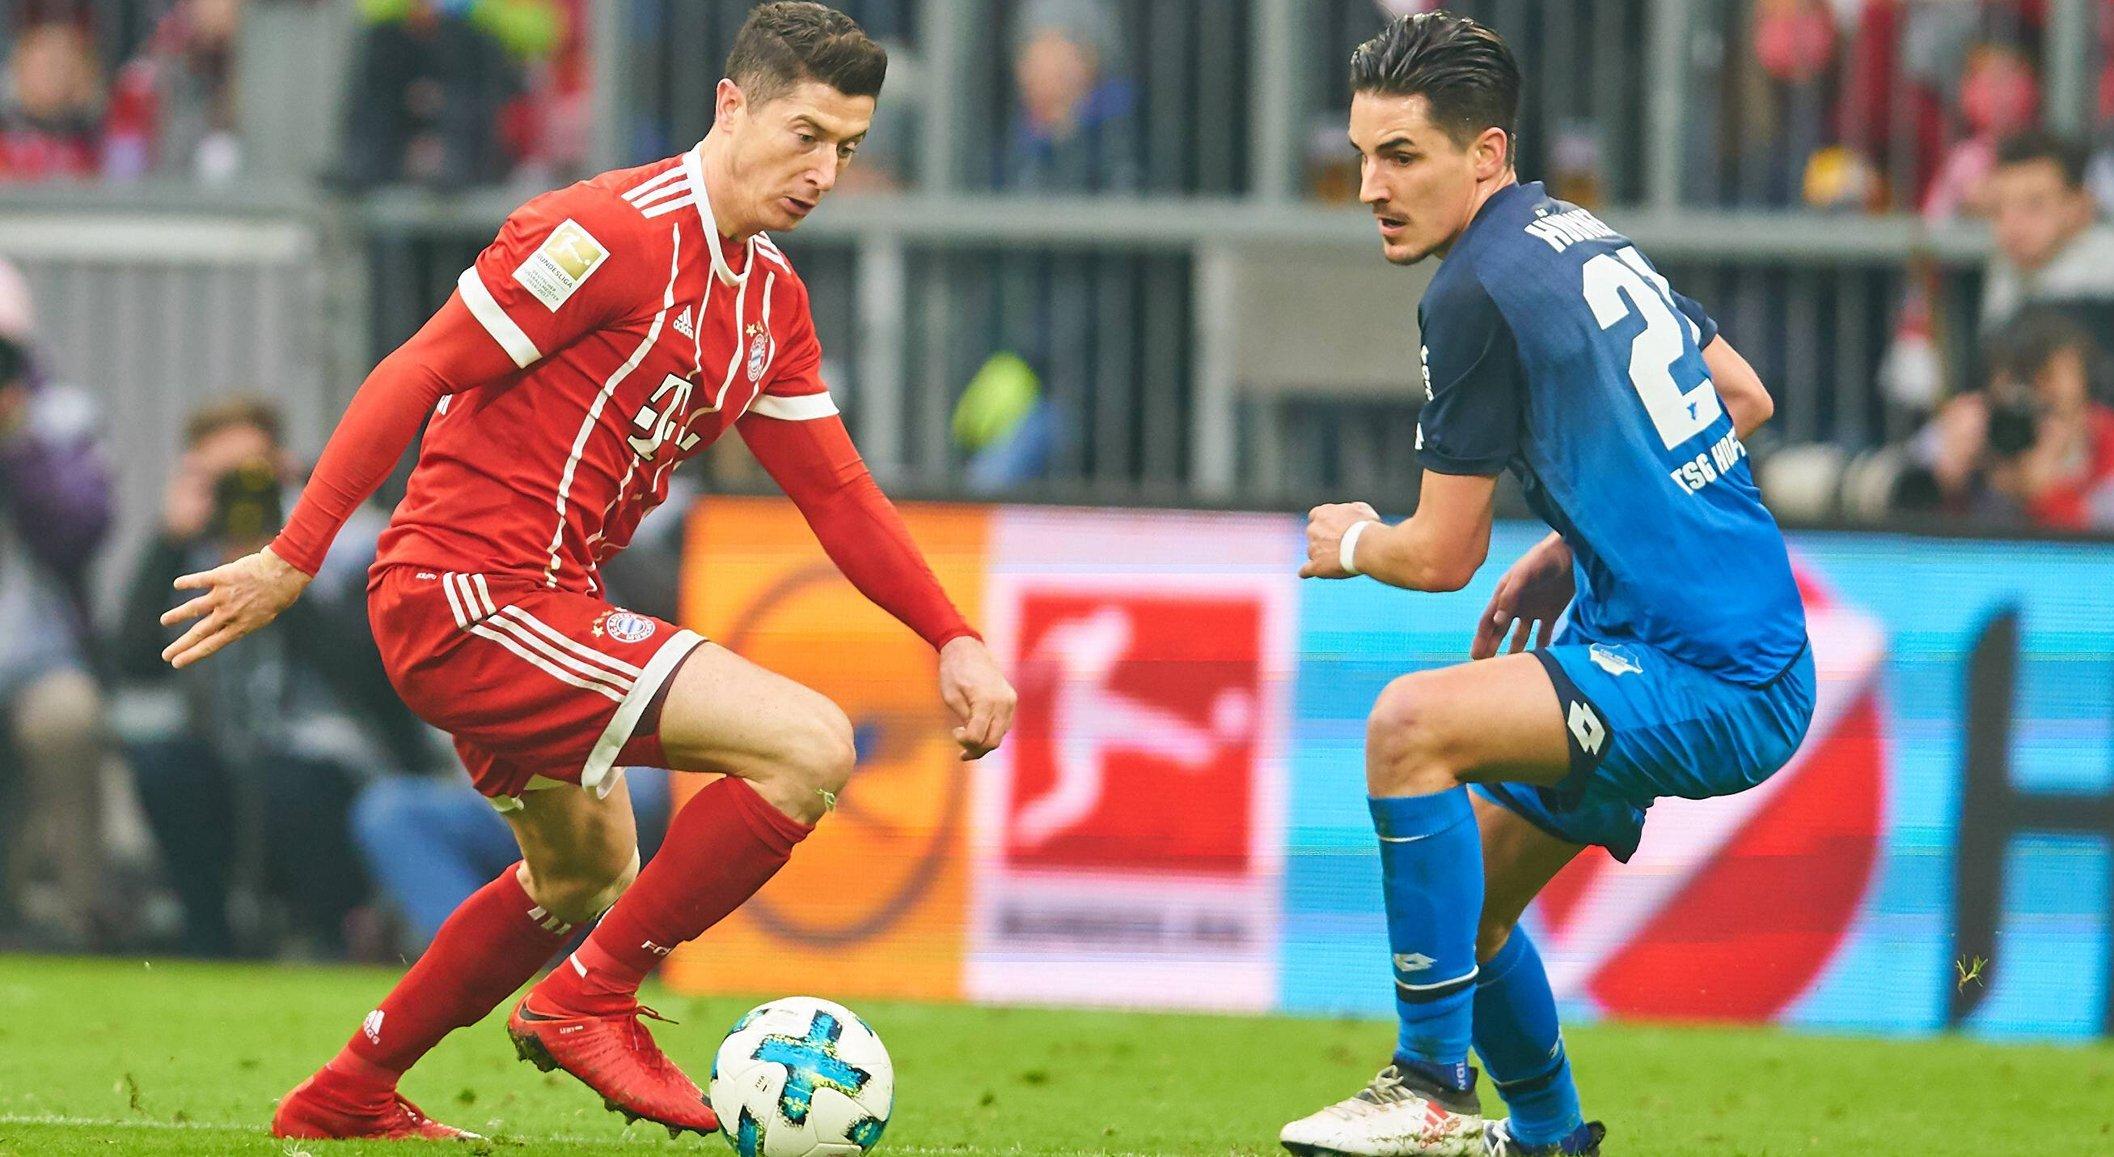 Футбол.Германия.Бундеслига 2.Кайзерслаутерн-Мюнхен ставки,прогнозы на спорт